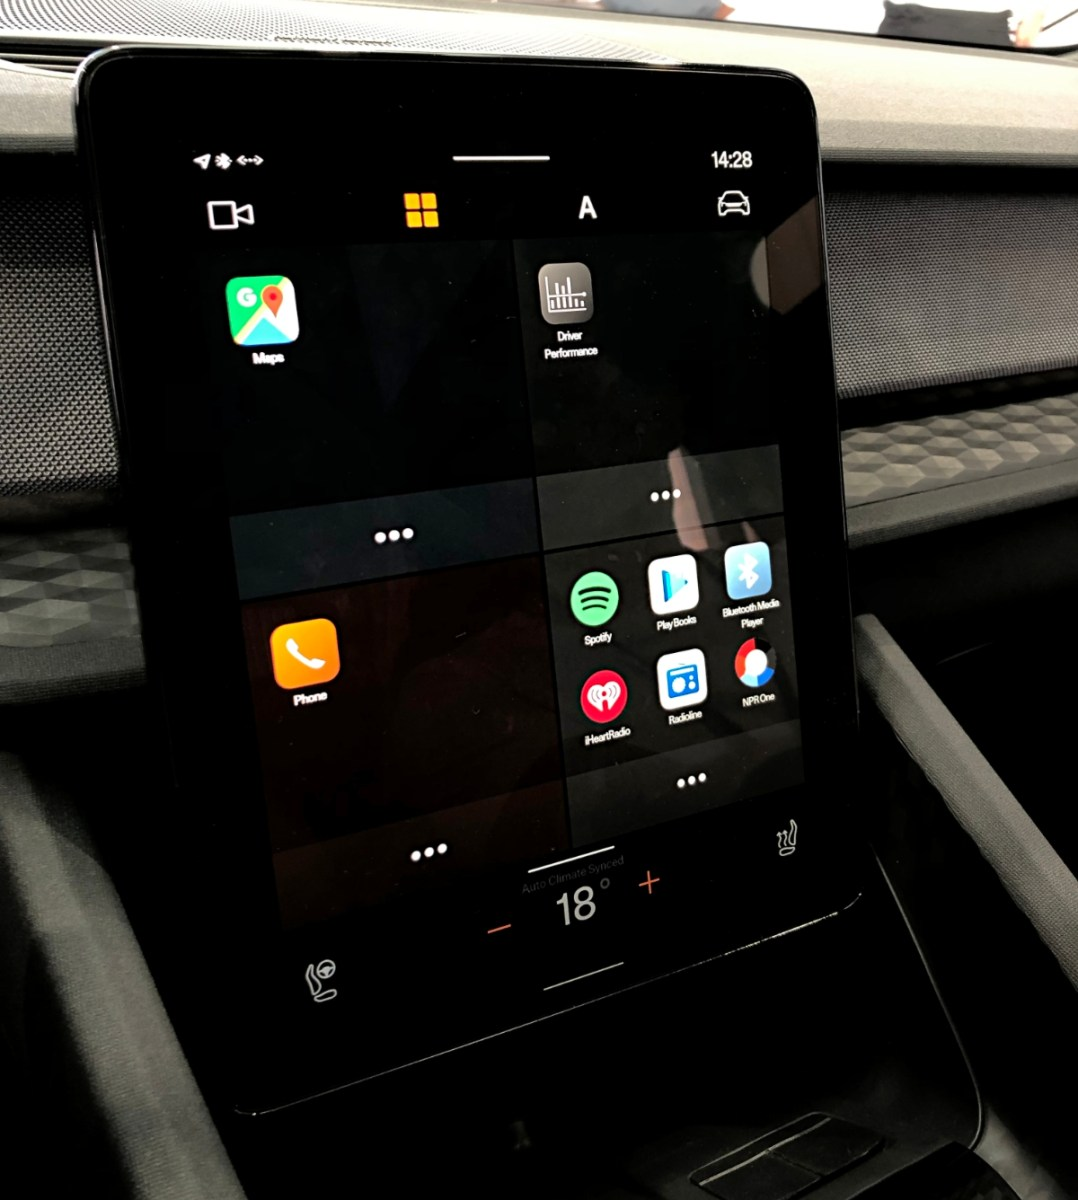 Volvo Polestar 2 Android Auto